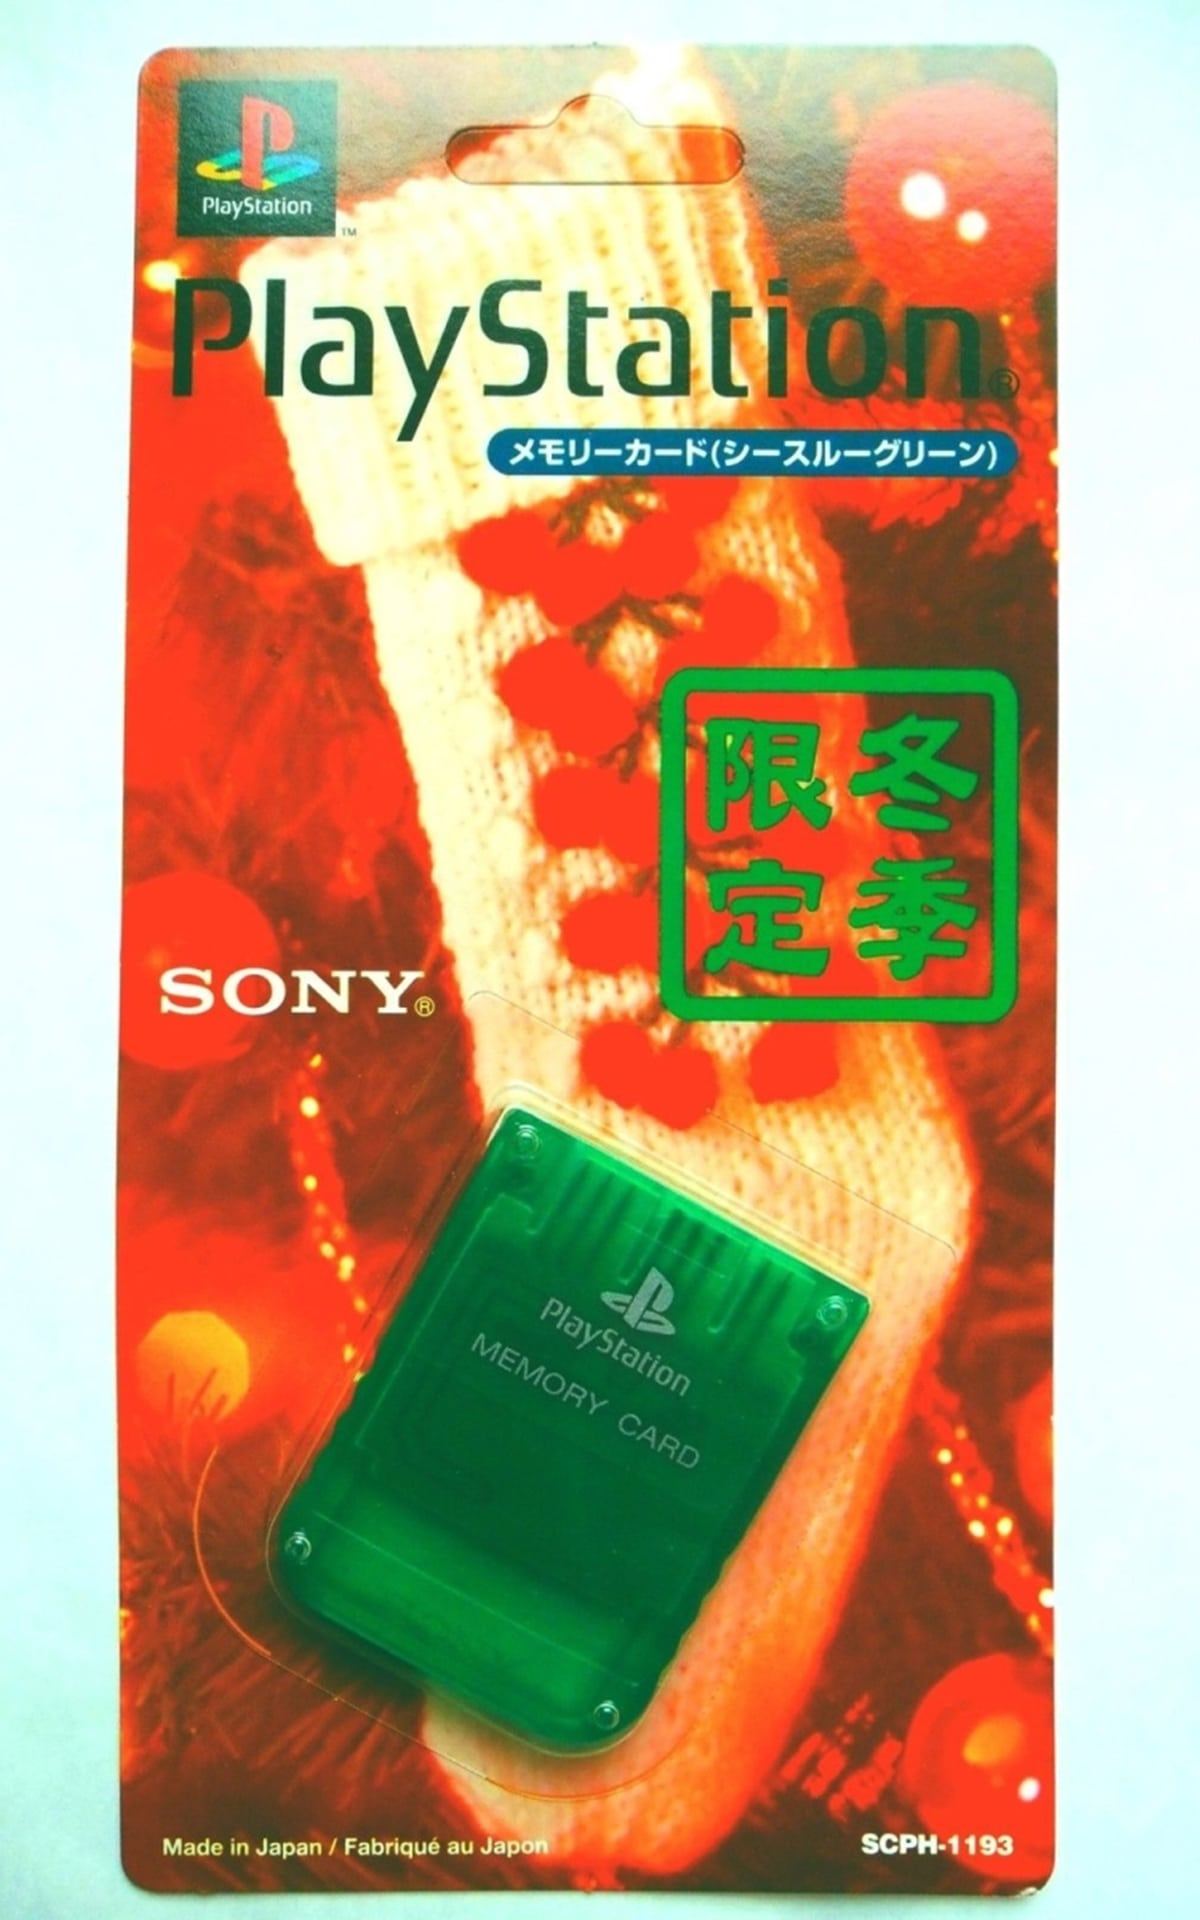 memory card scph 1093 061 - [SCPH-1020] Memory Card / Karta pamięci